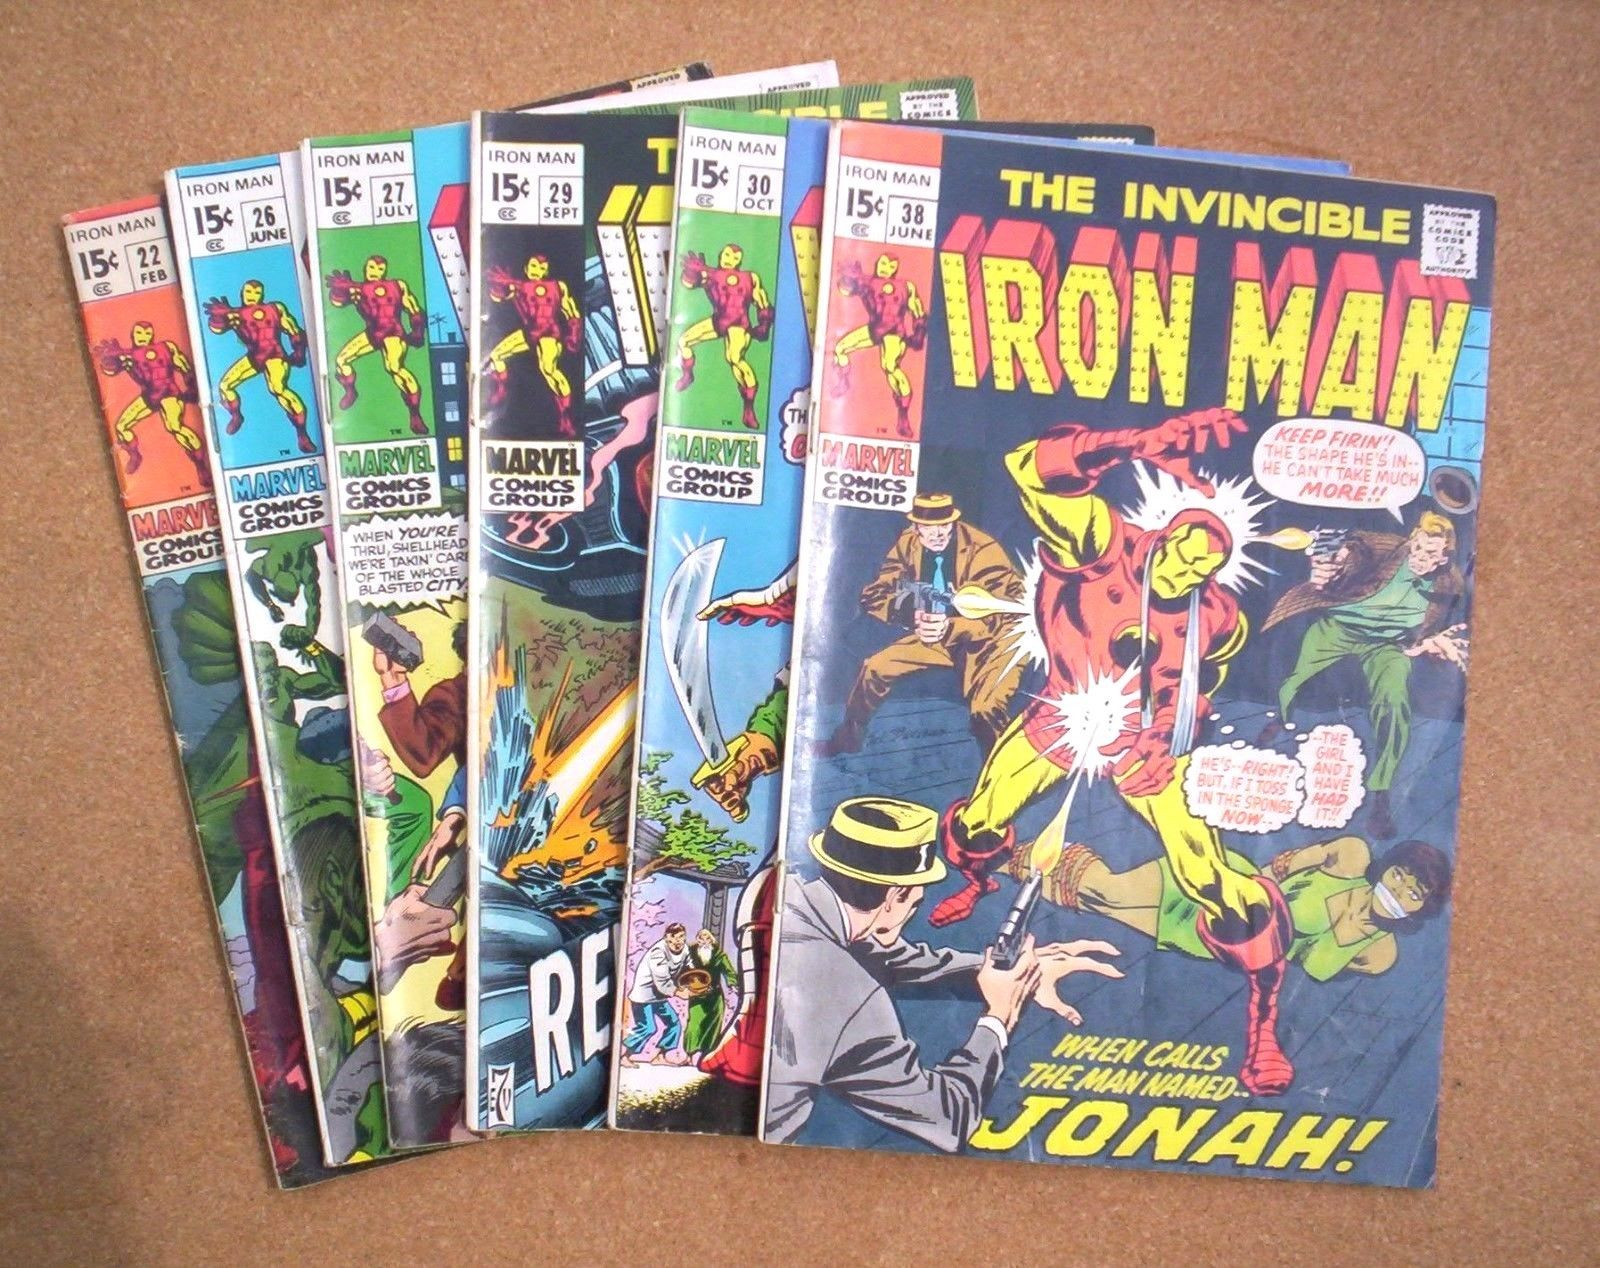 THE INVINCIBLE IRON MAN Comic Book Lot - #22,26,27,29,30,38 / Cry Revolution